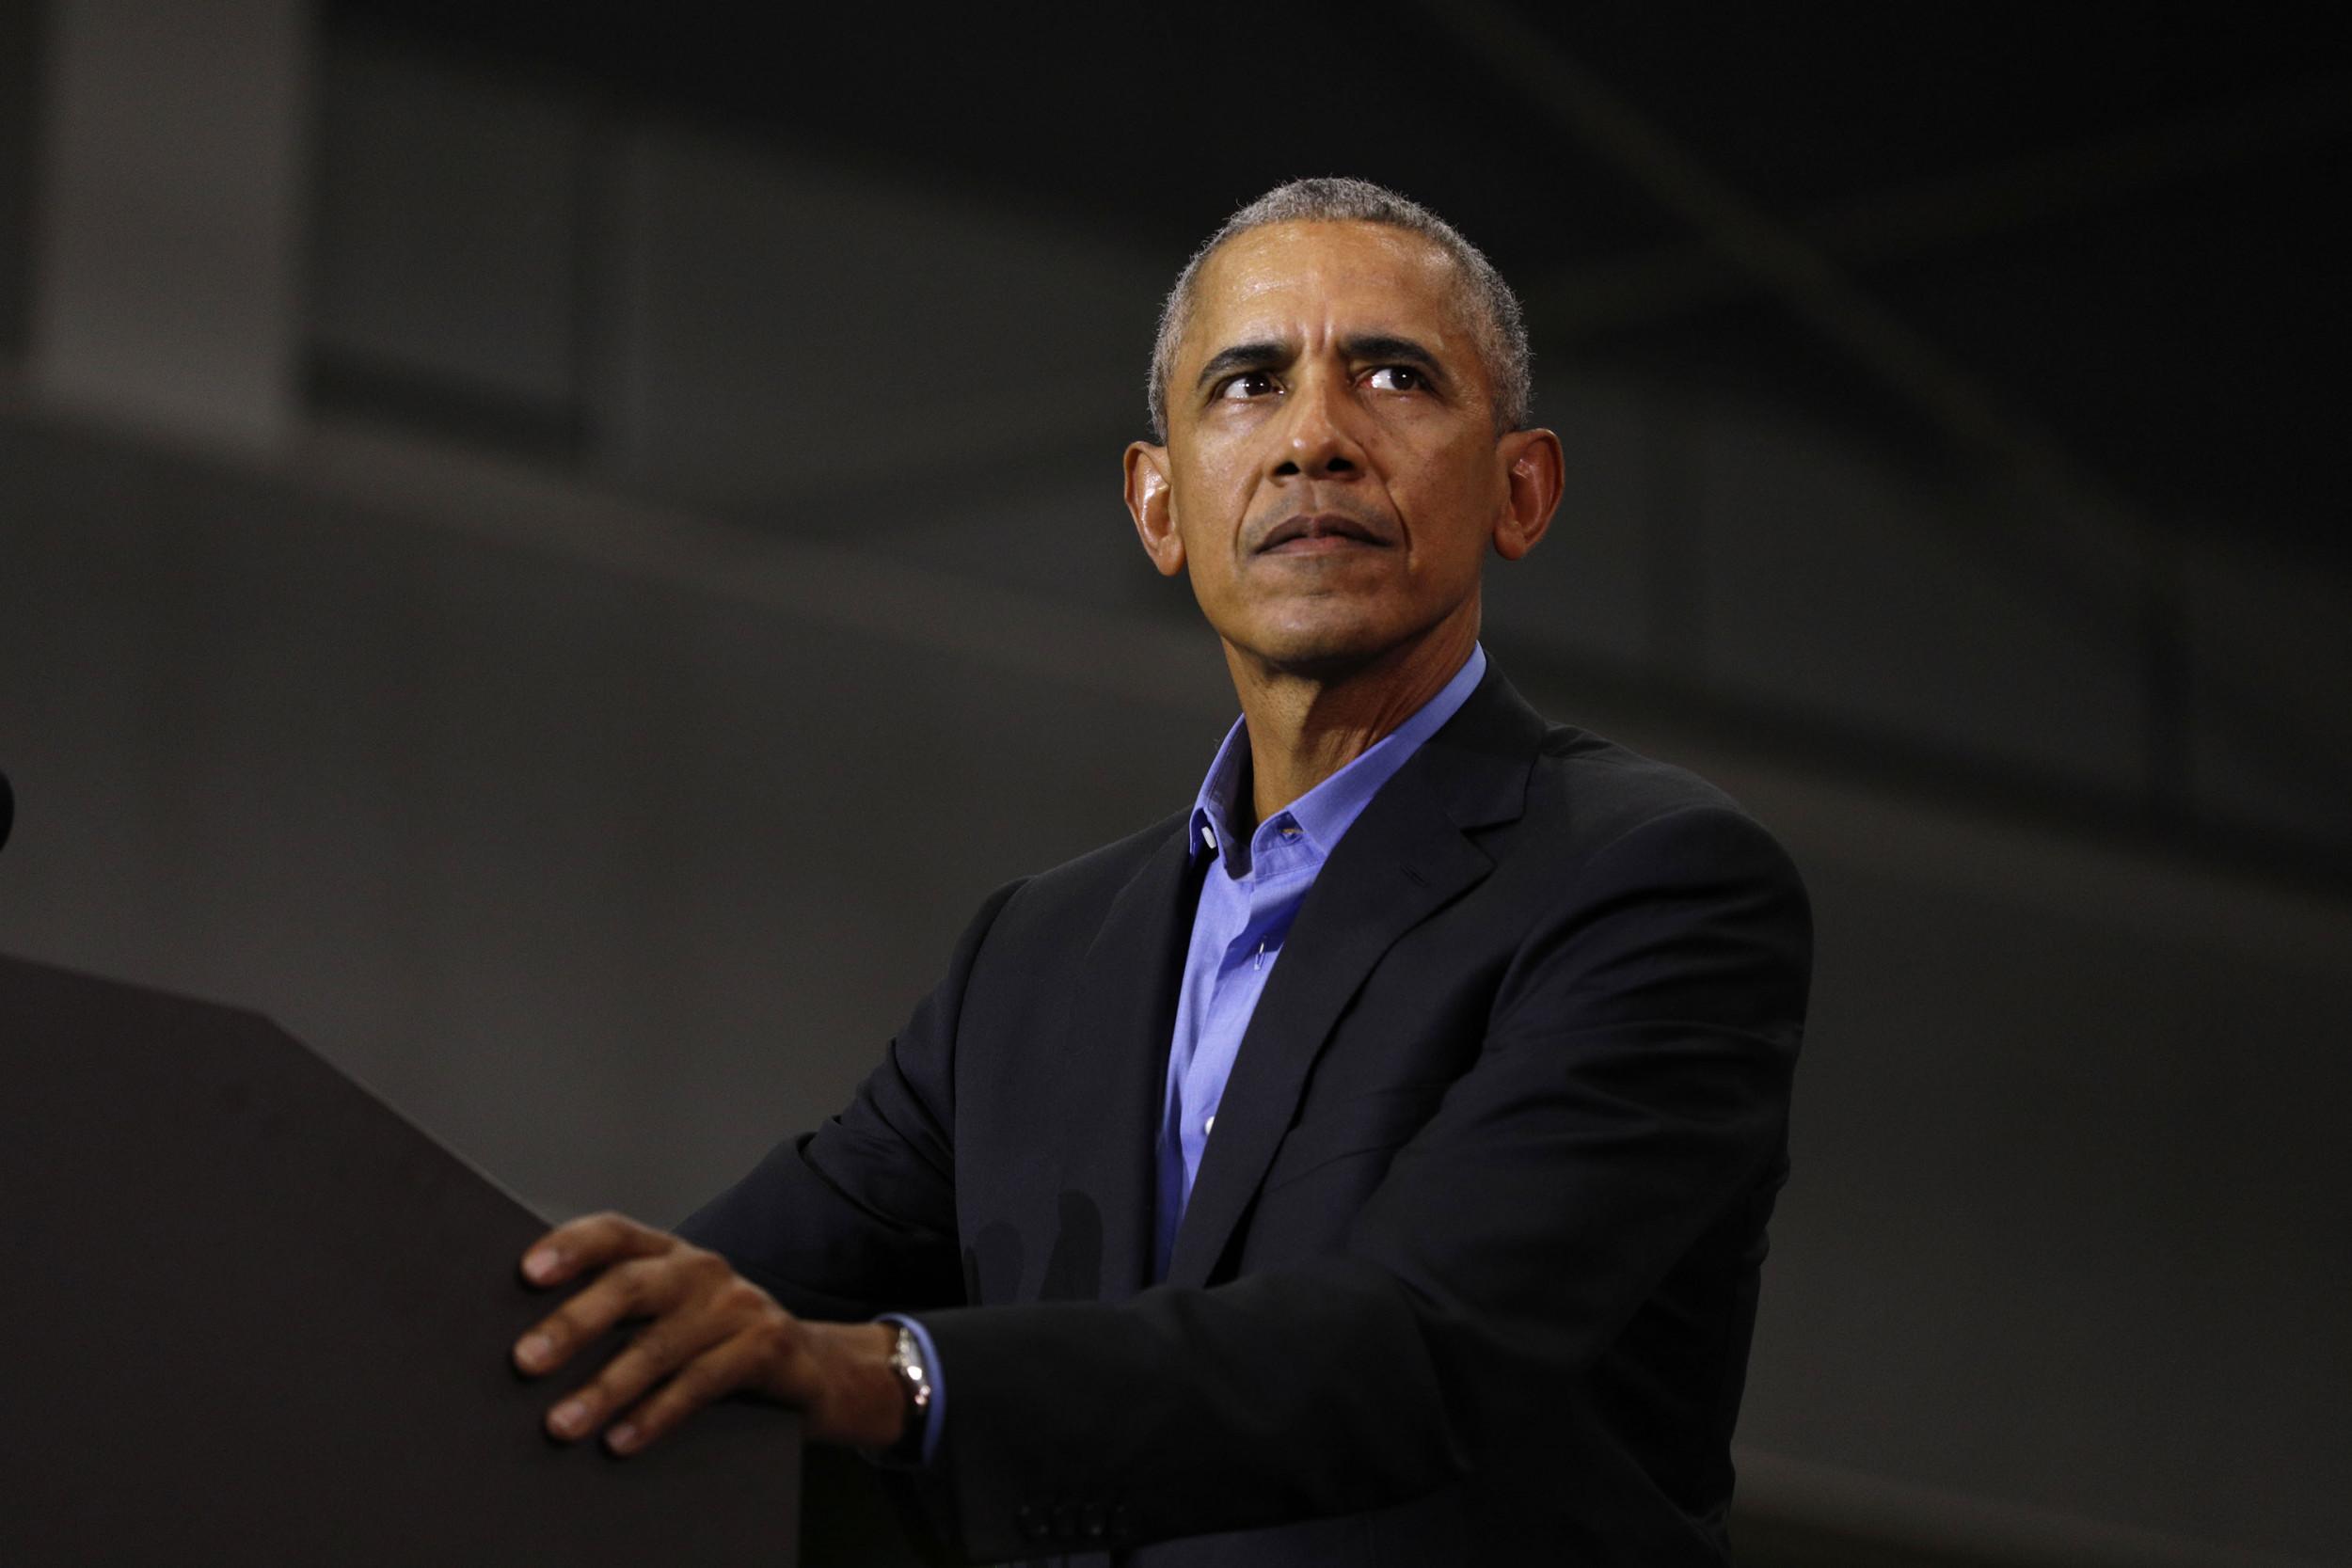 "Barack Obama shares 9/11 tribute recalling ""spirit of unity"" after terror attacks"